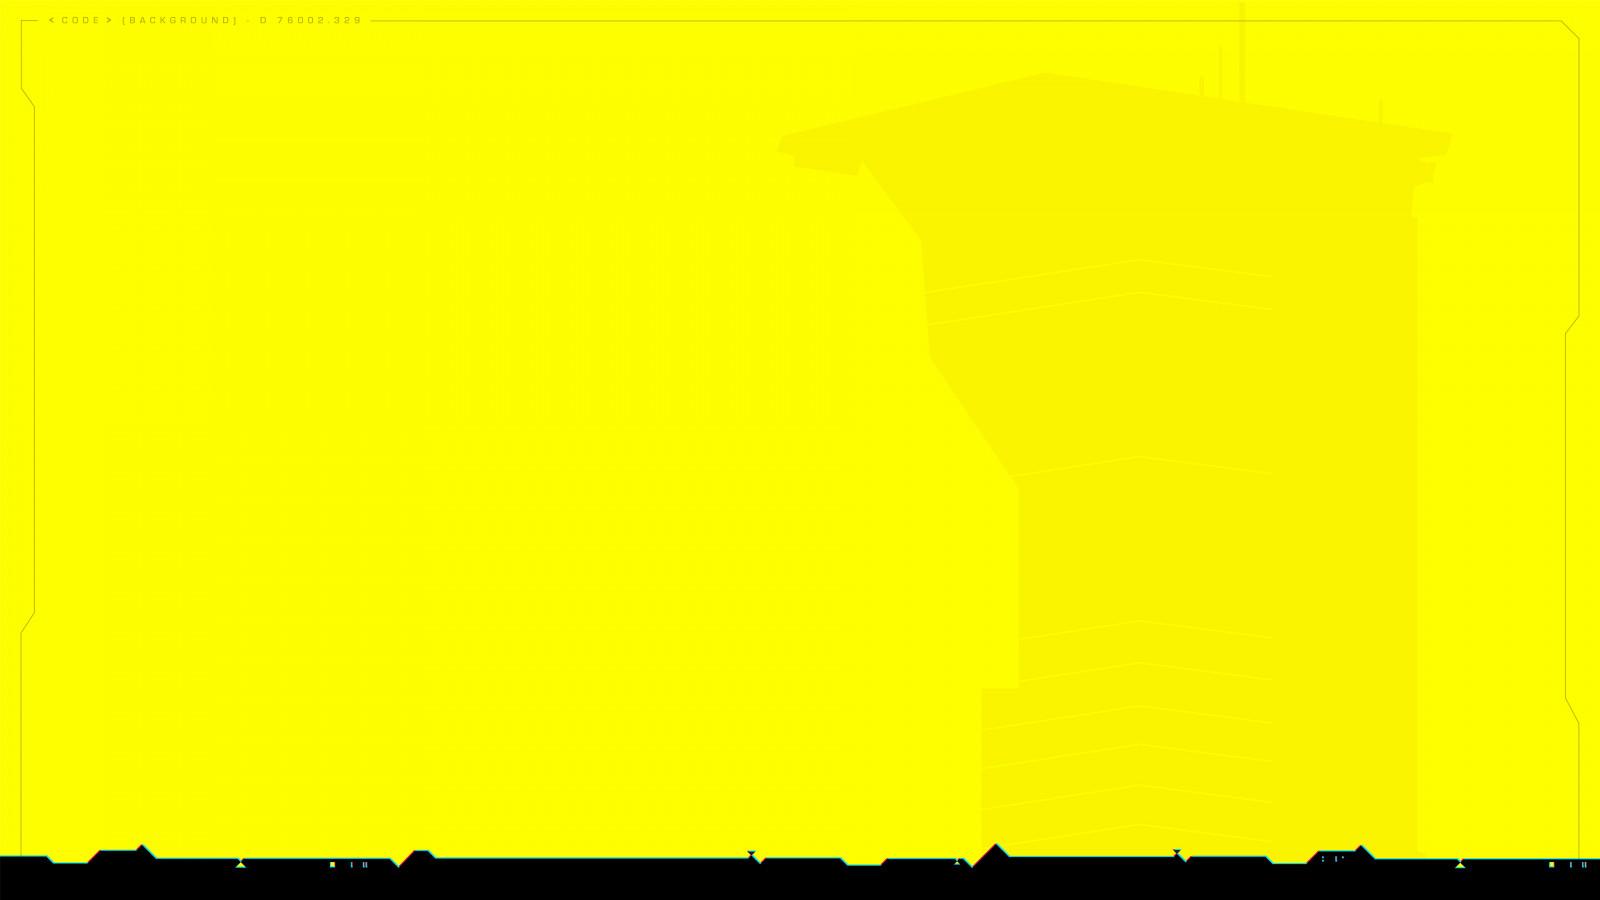 Wallpaper : cyberpunk, Cyberpunk 2077, yellow background ...